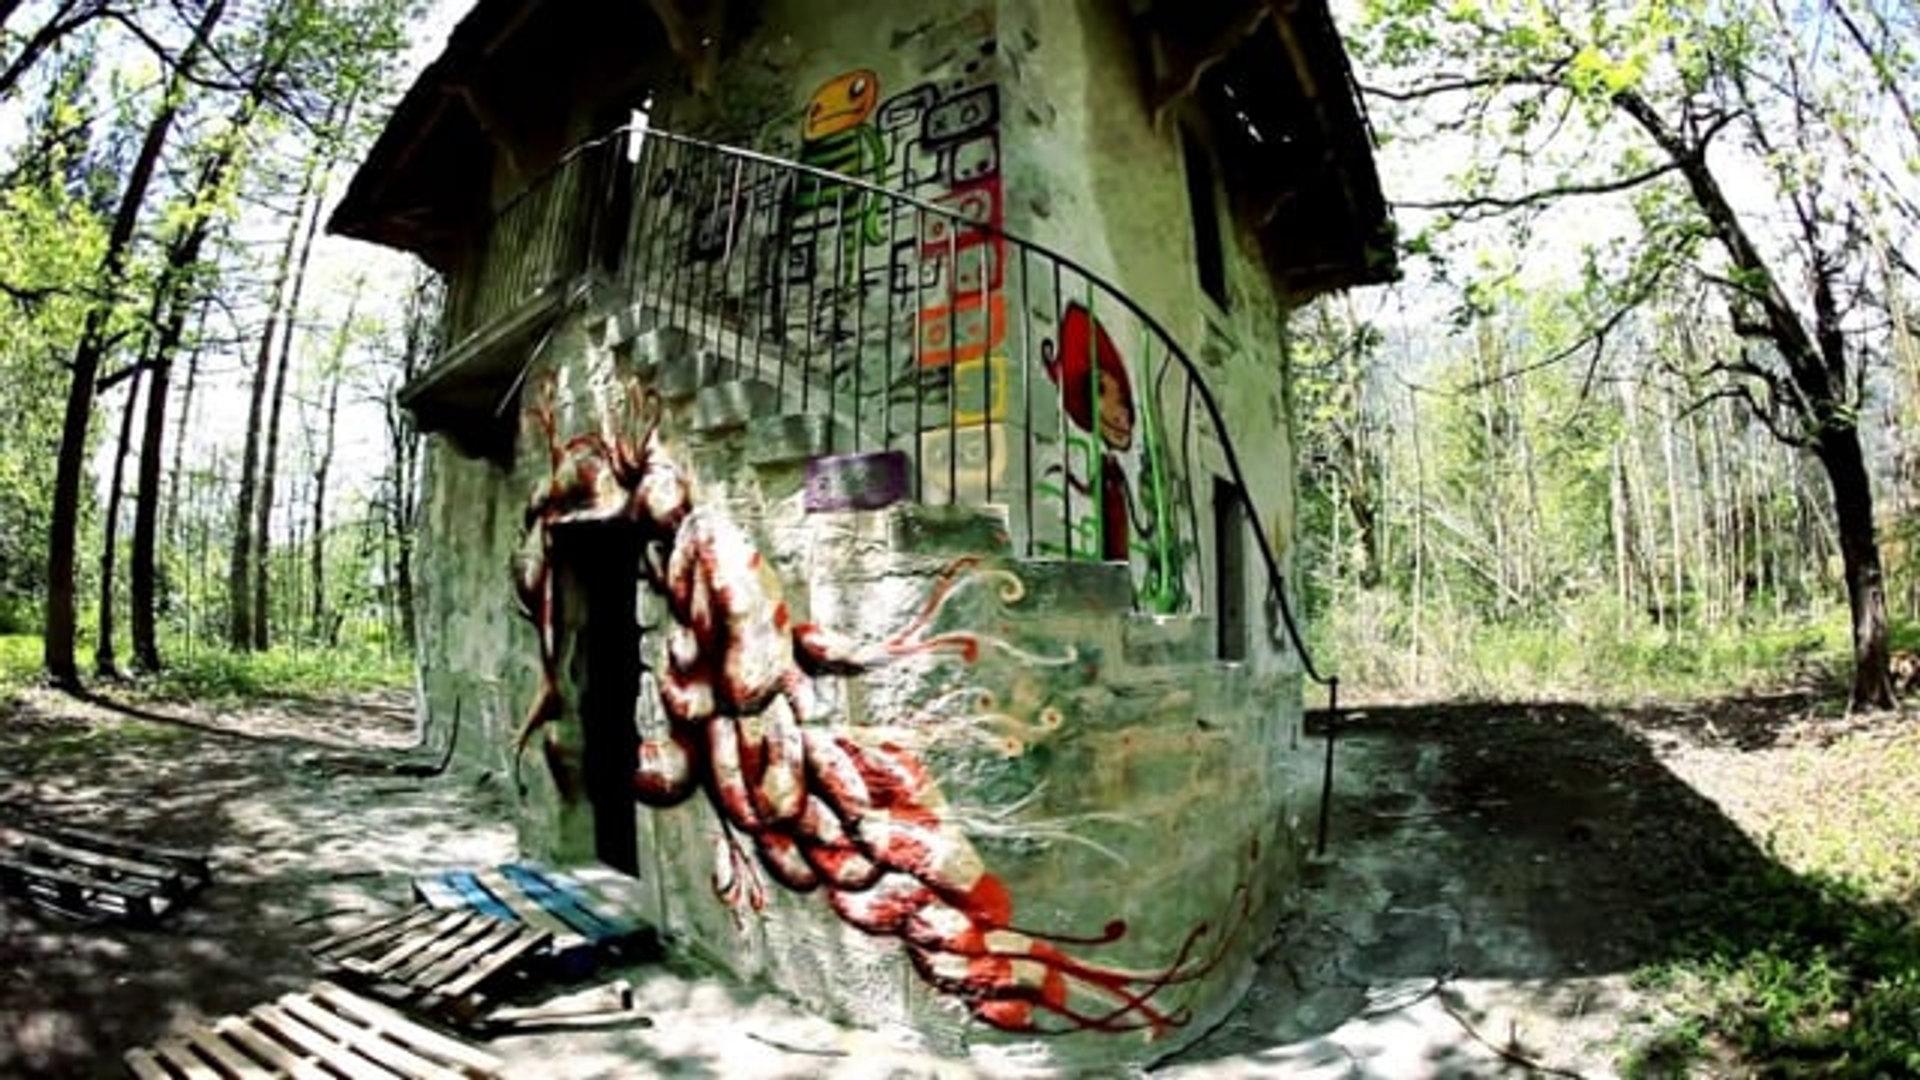 Graff Sowlfureux